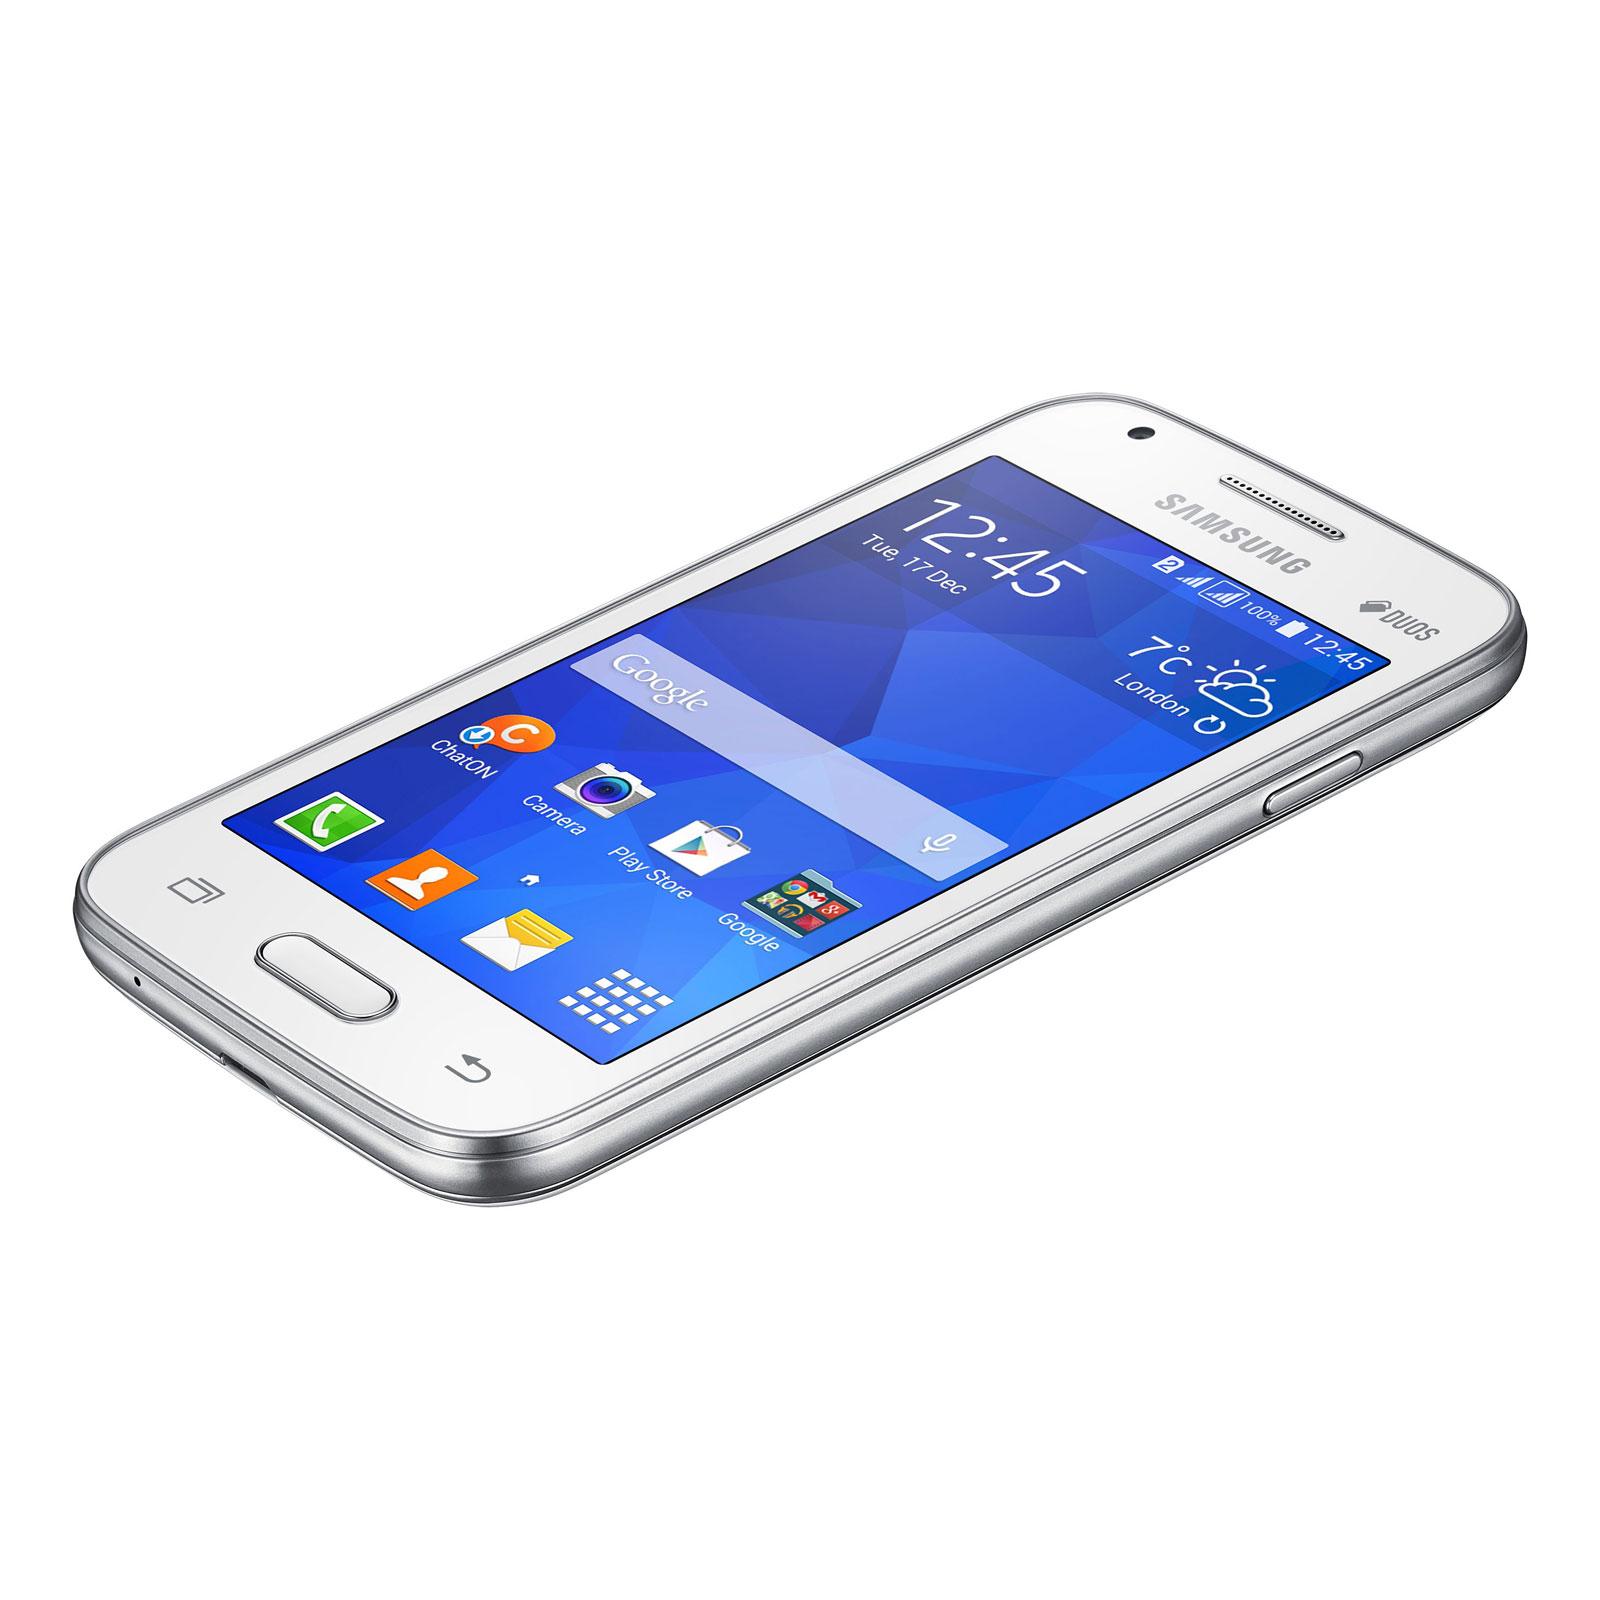 Samsung galaxy trend 2 lite sm g318 blanc mobile smartphone samsung sur ldlc - Portable samsung galaxy trend lite blanc ...